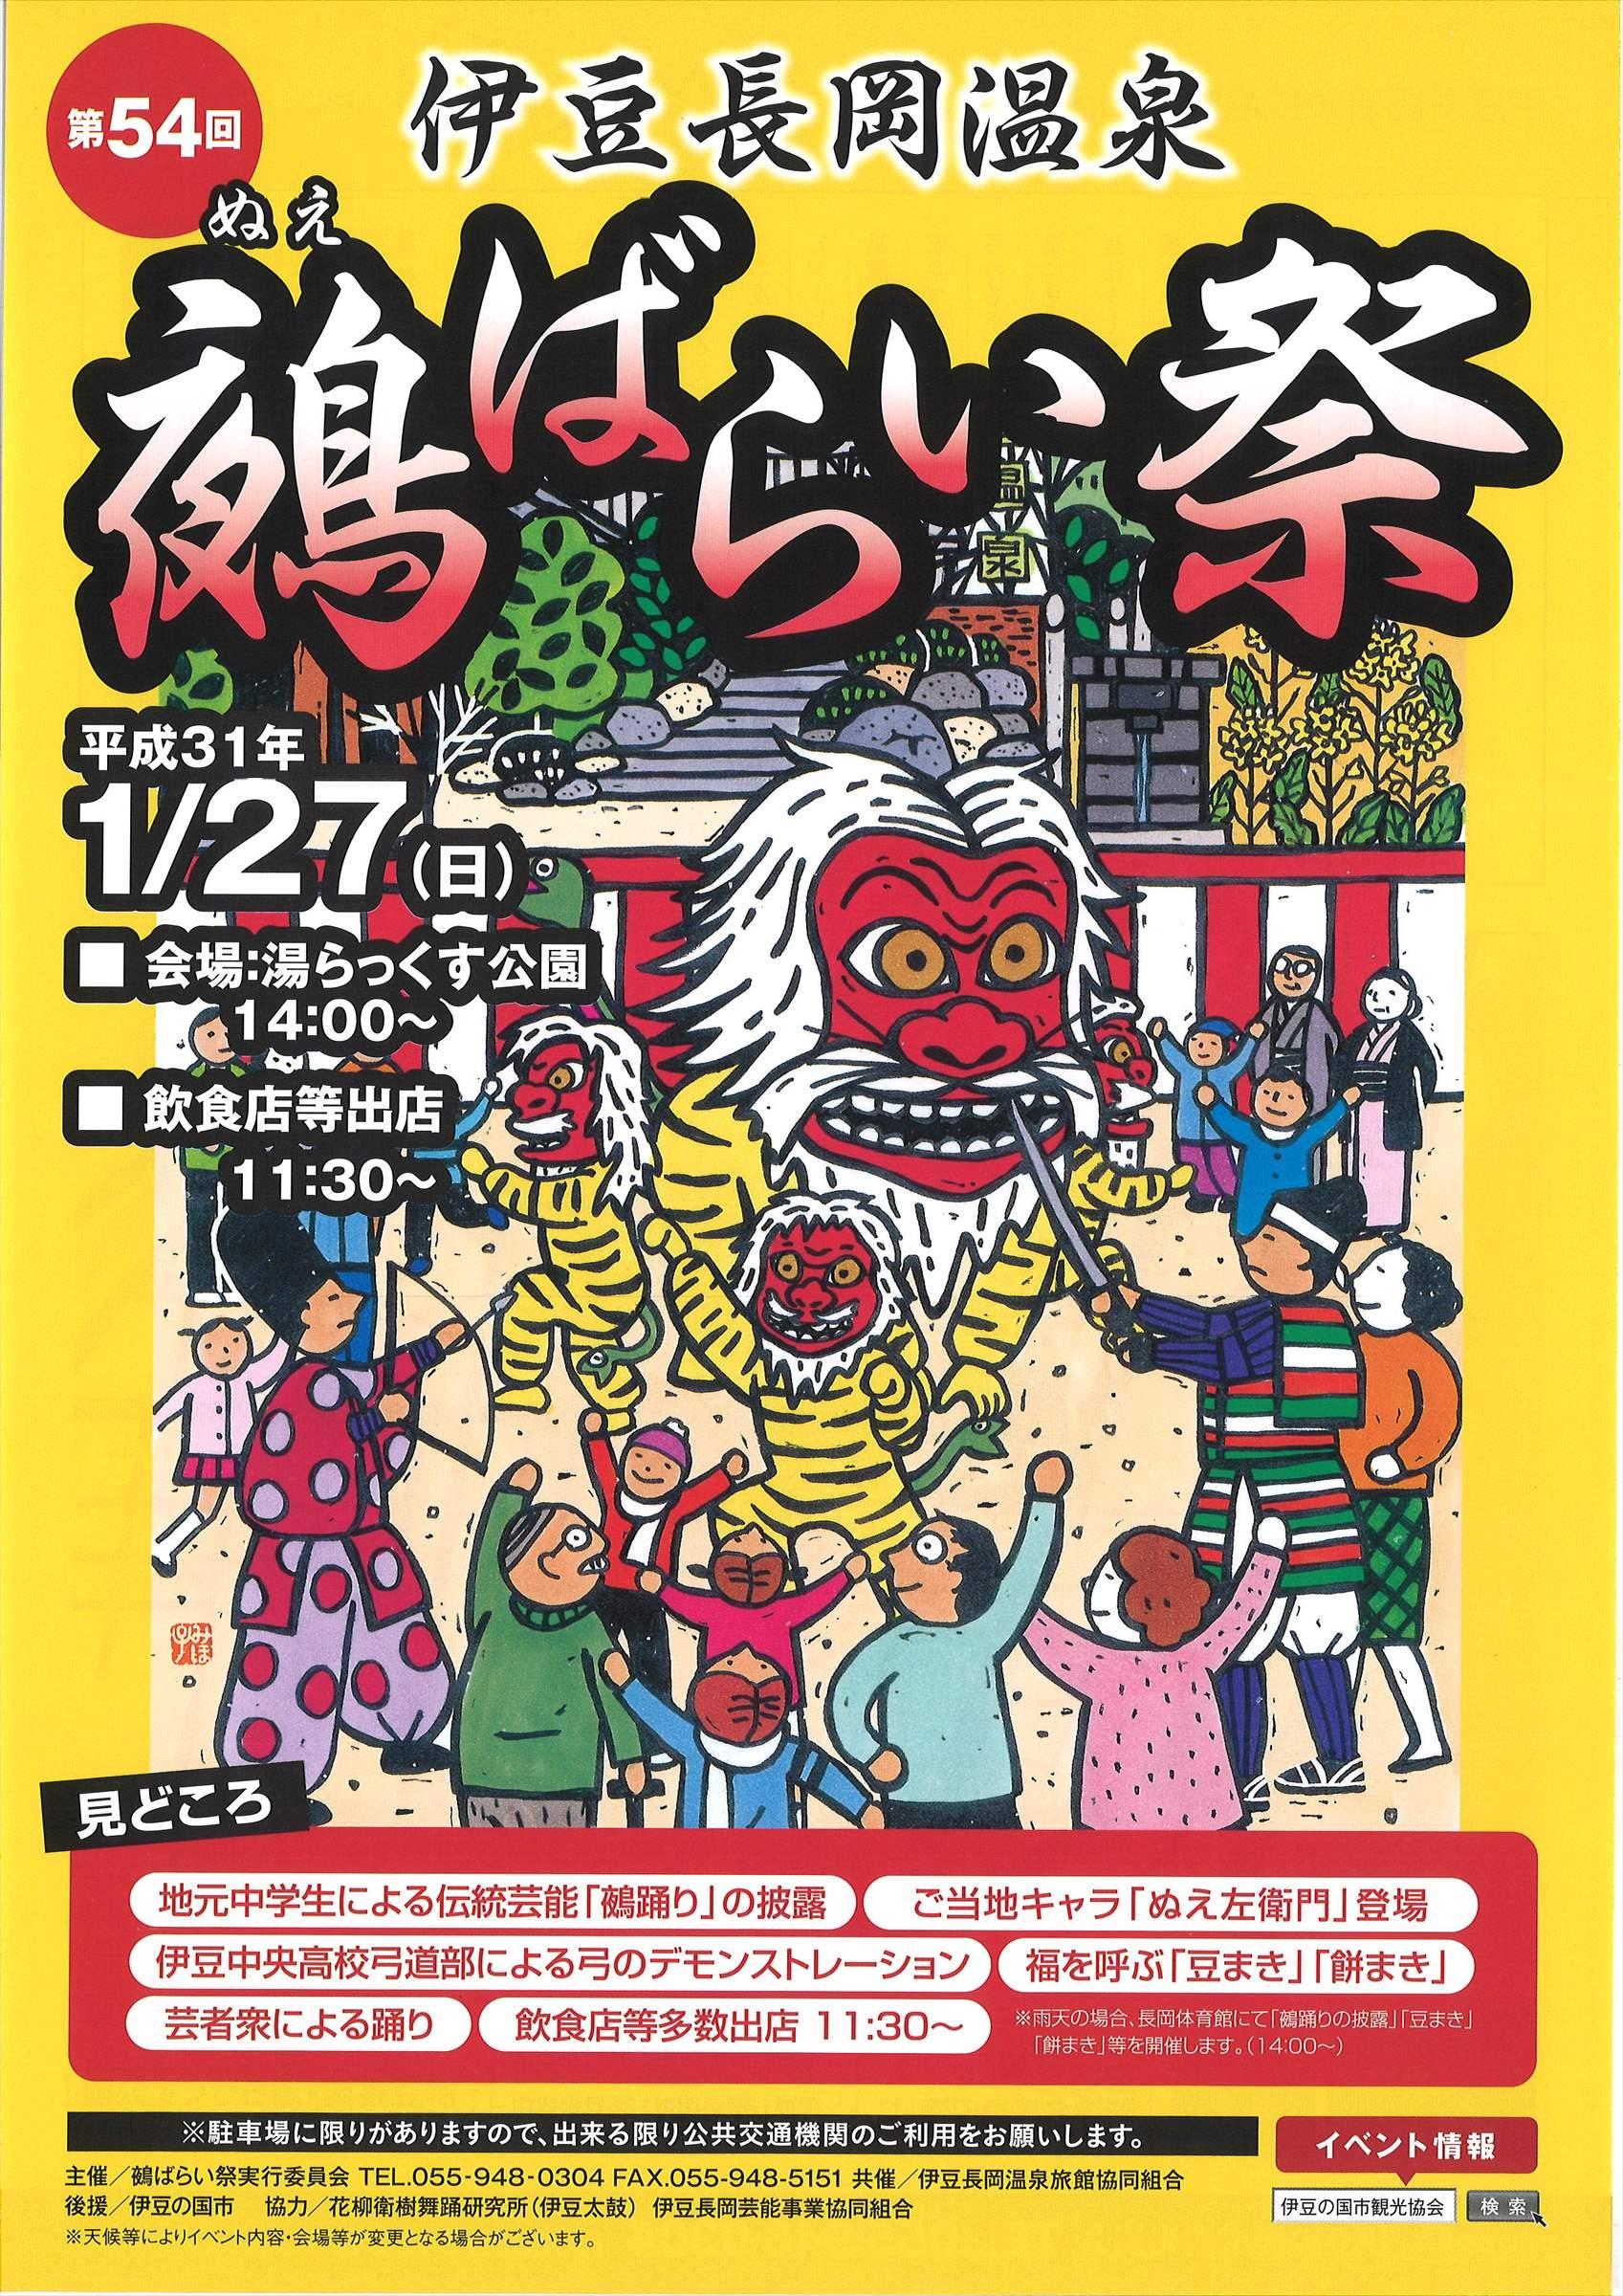 align:none link:0 alt:0 1/27(日)伊豆長岡温泉 鵺ばらい祭開催!l